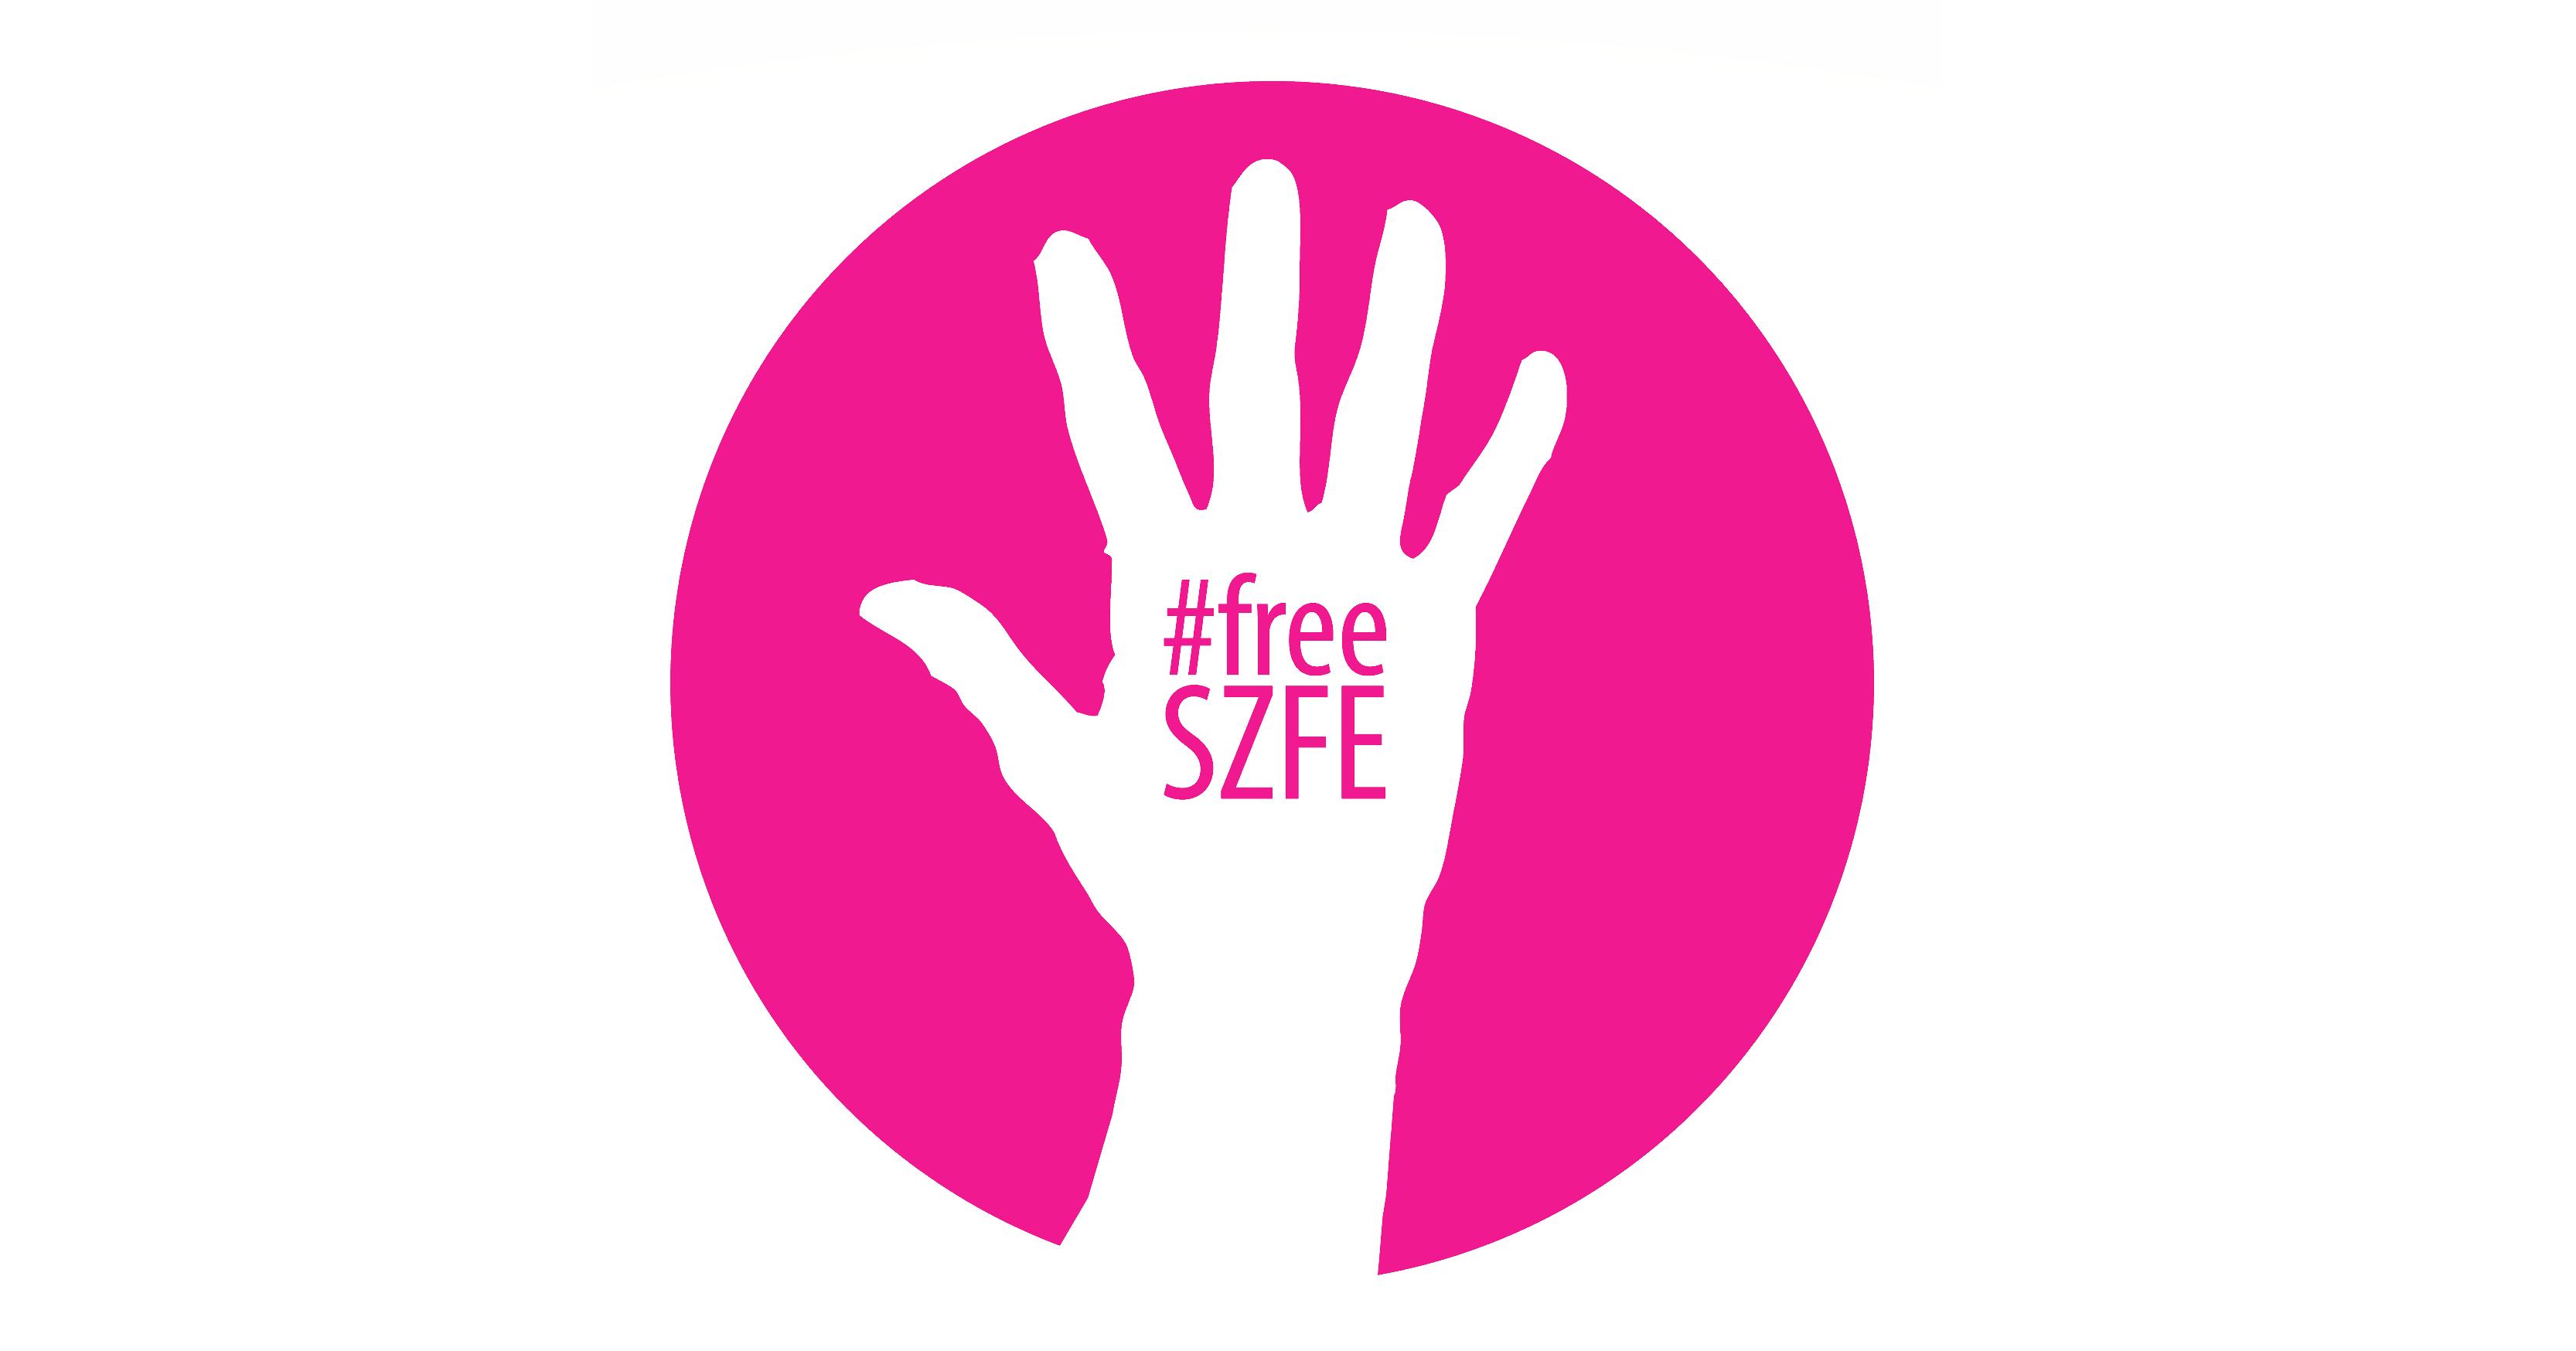 freeszfe_pink_dl.png